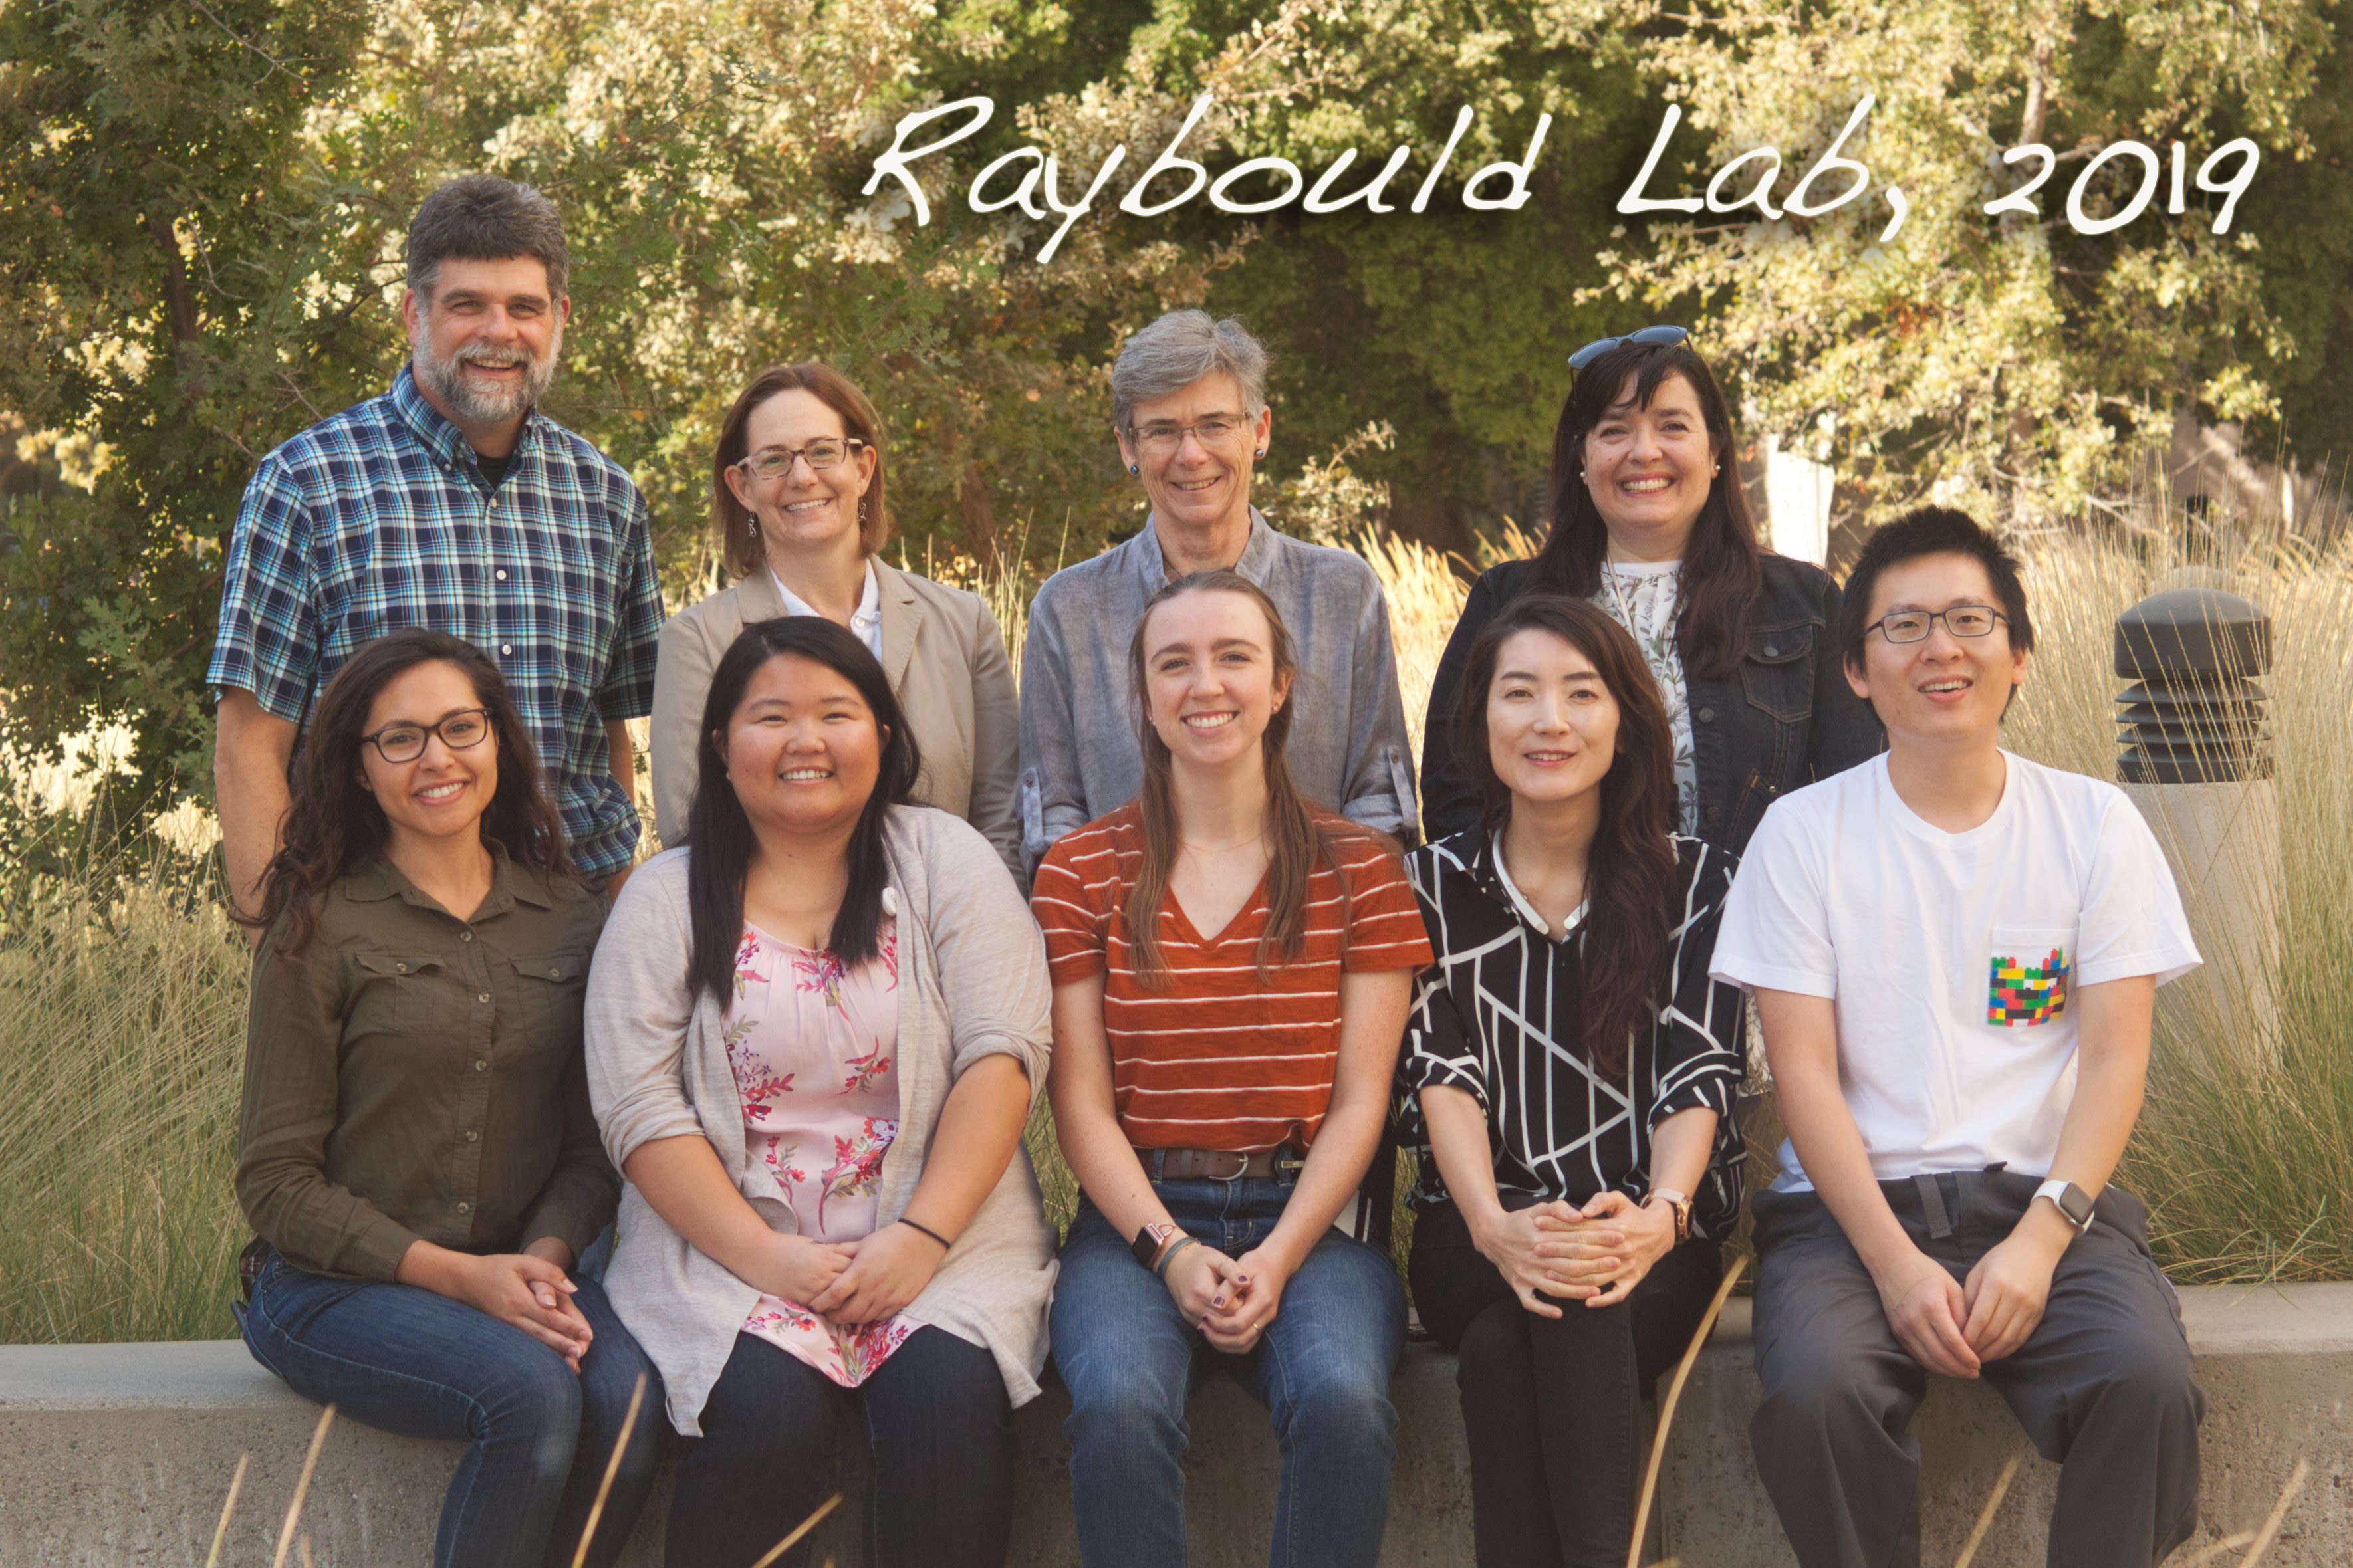 Raybould Lab, 2019